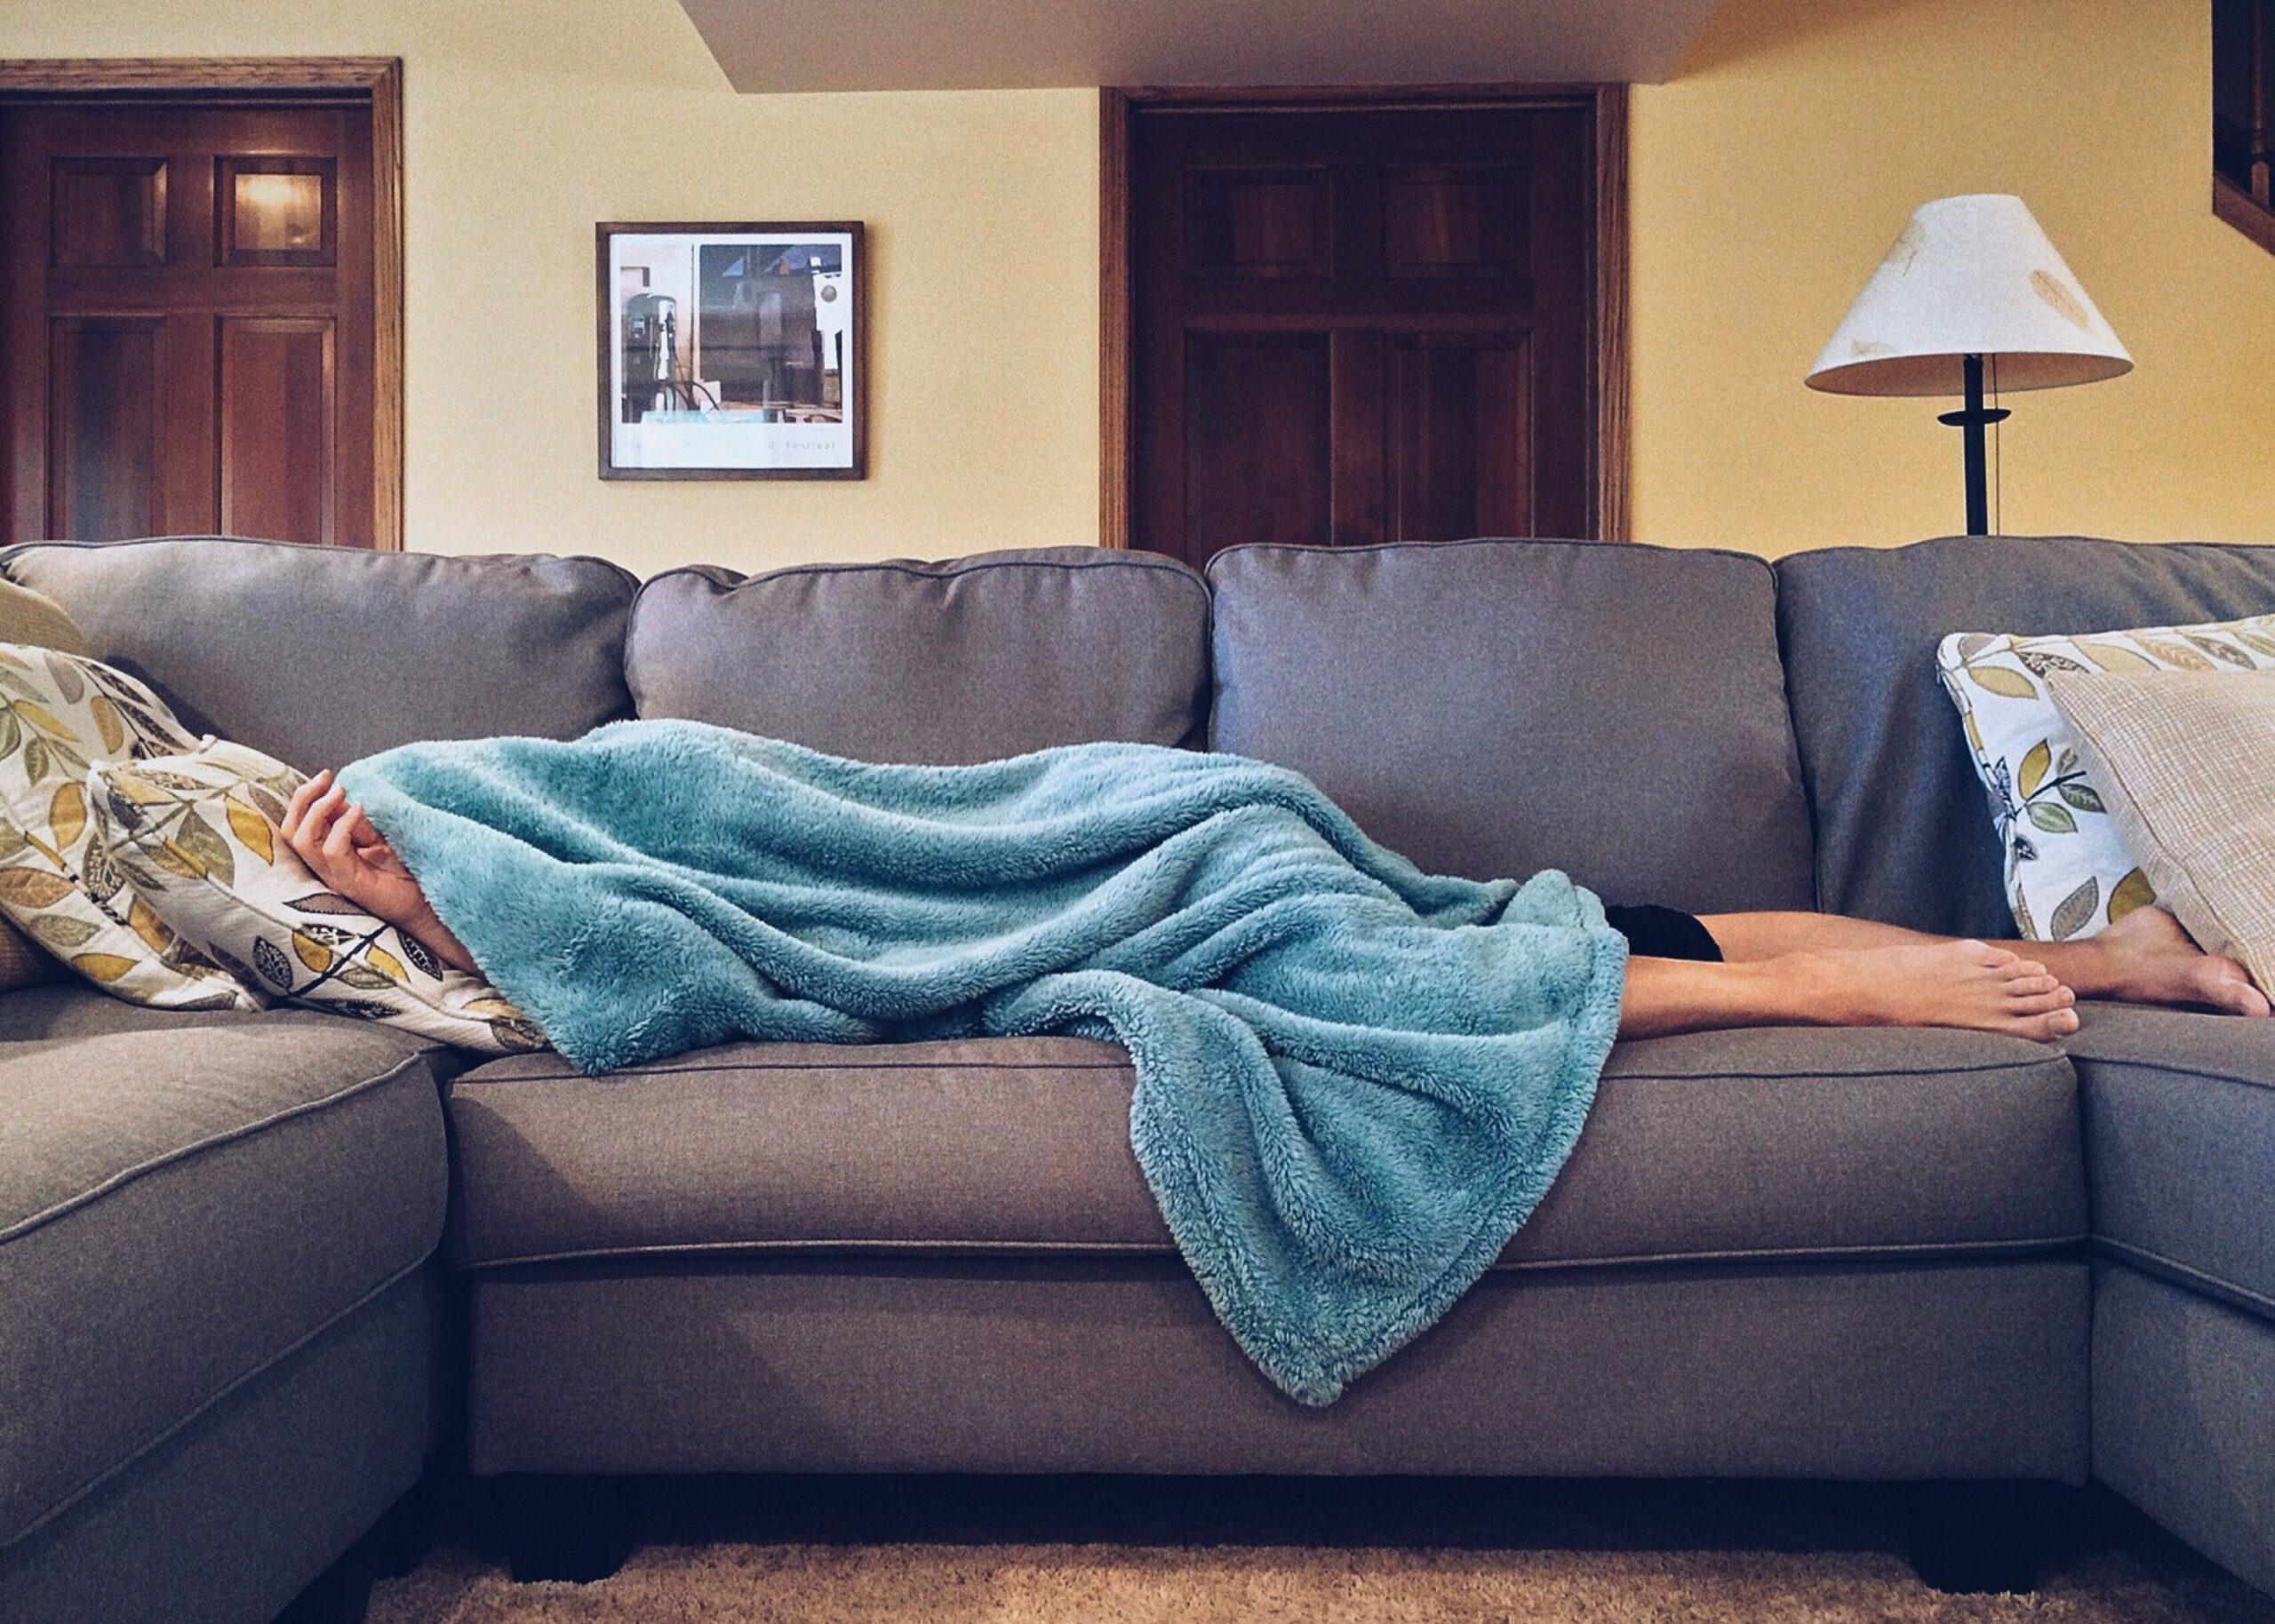 Couchsurfing, la frontiera del viaggio low cost